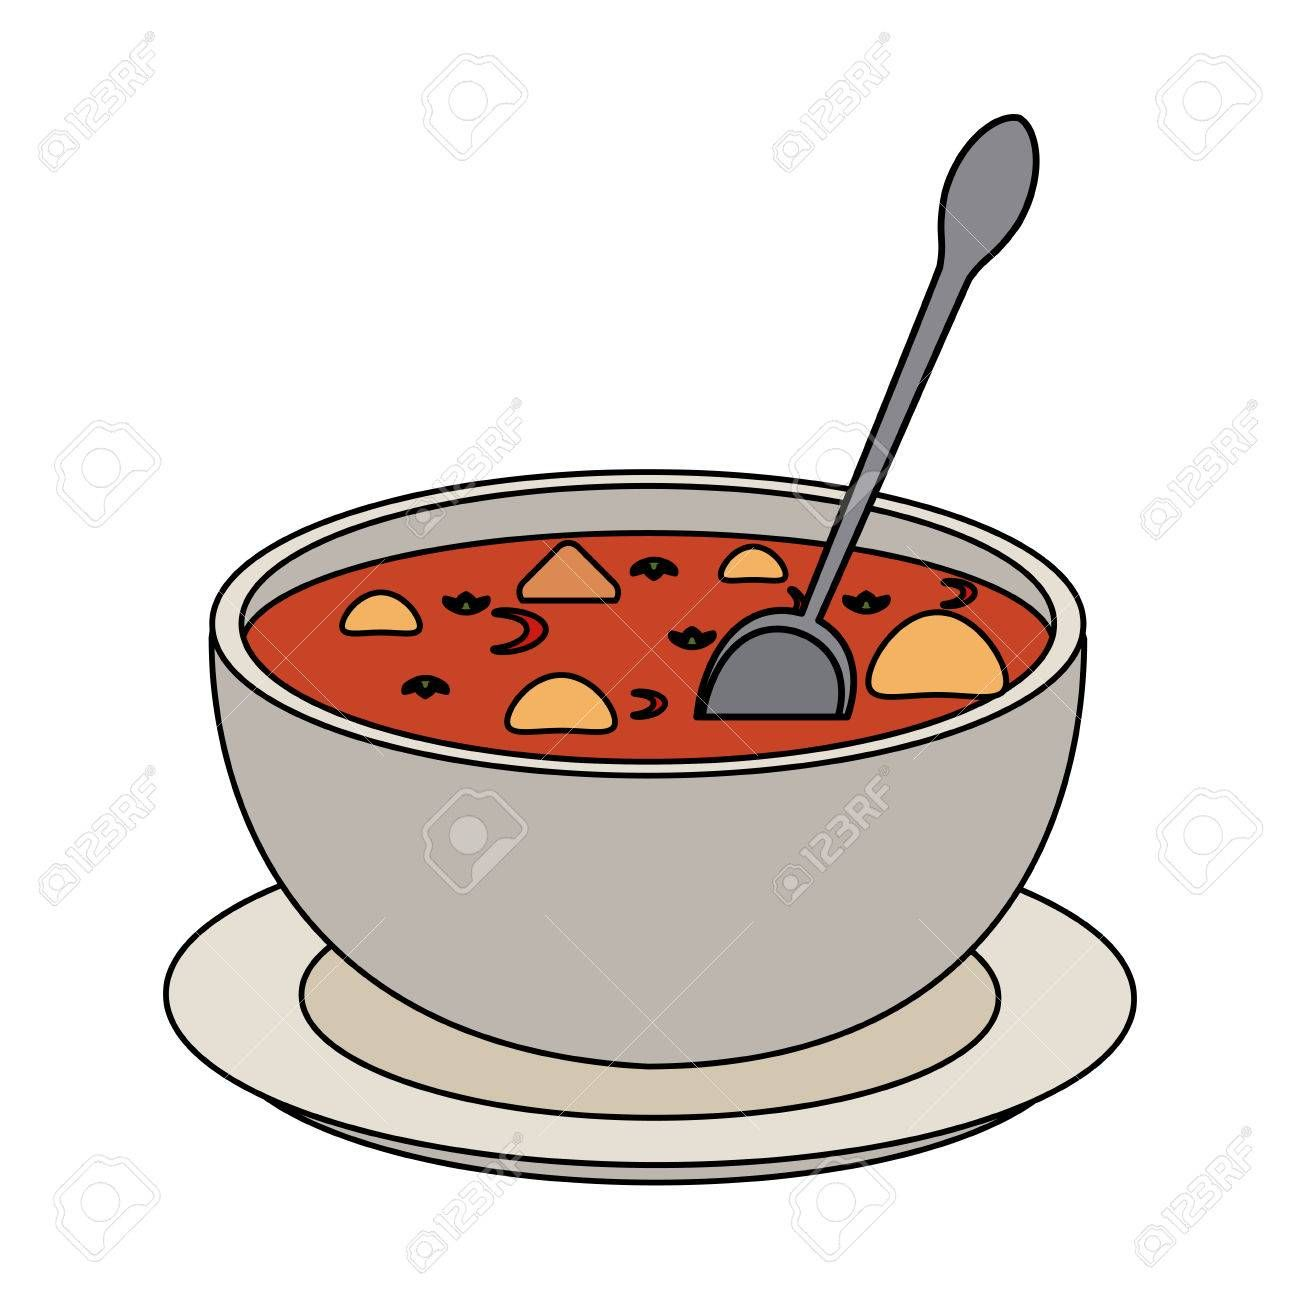 Image Result For Clipart Of Soup Bowls Bowl Clip Art